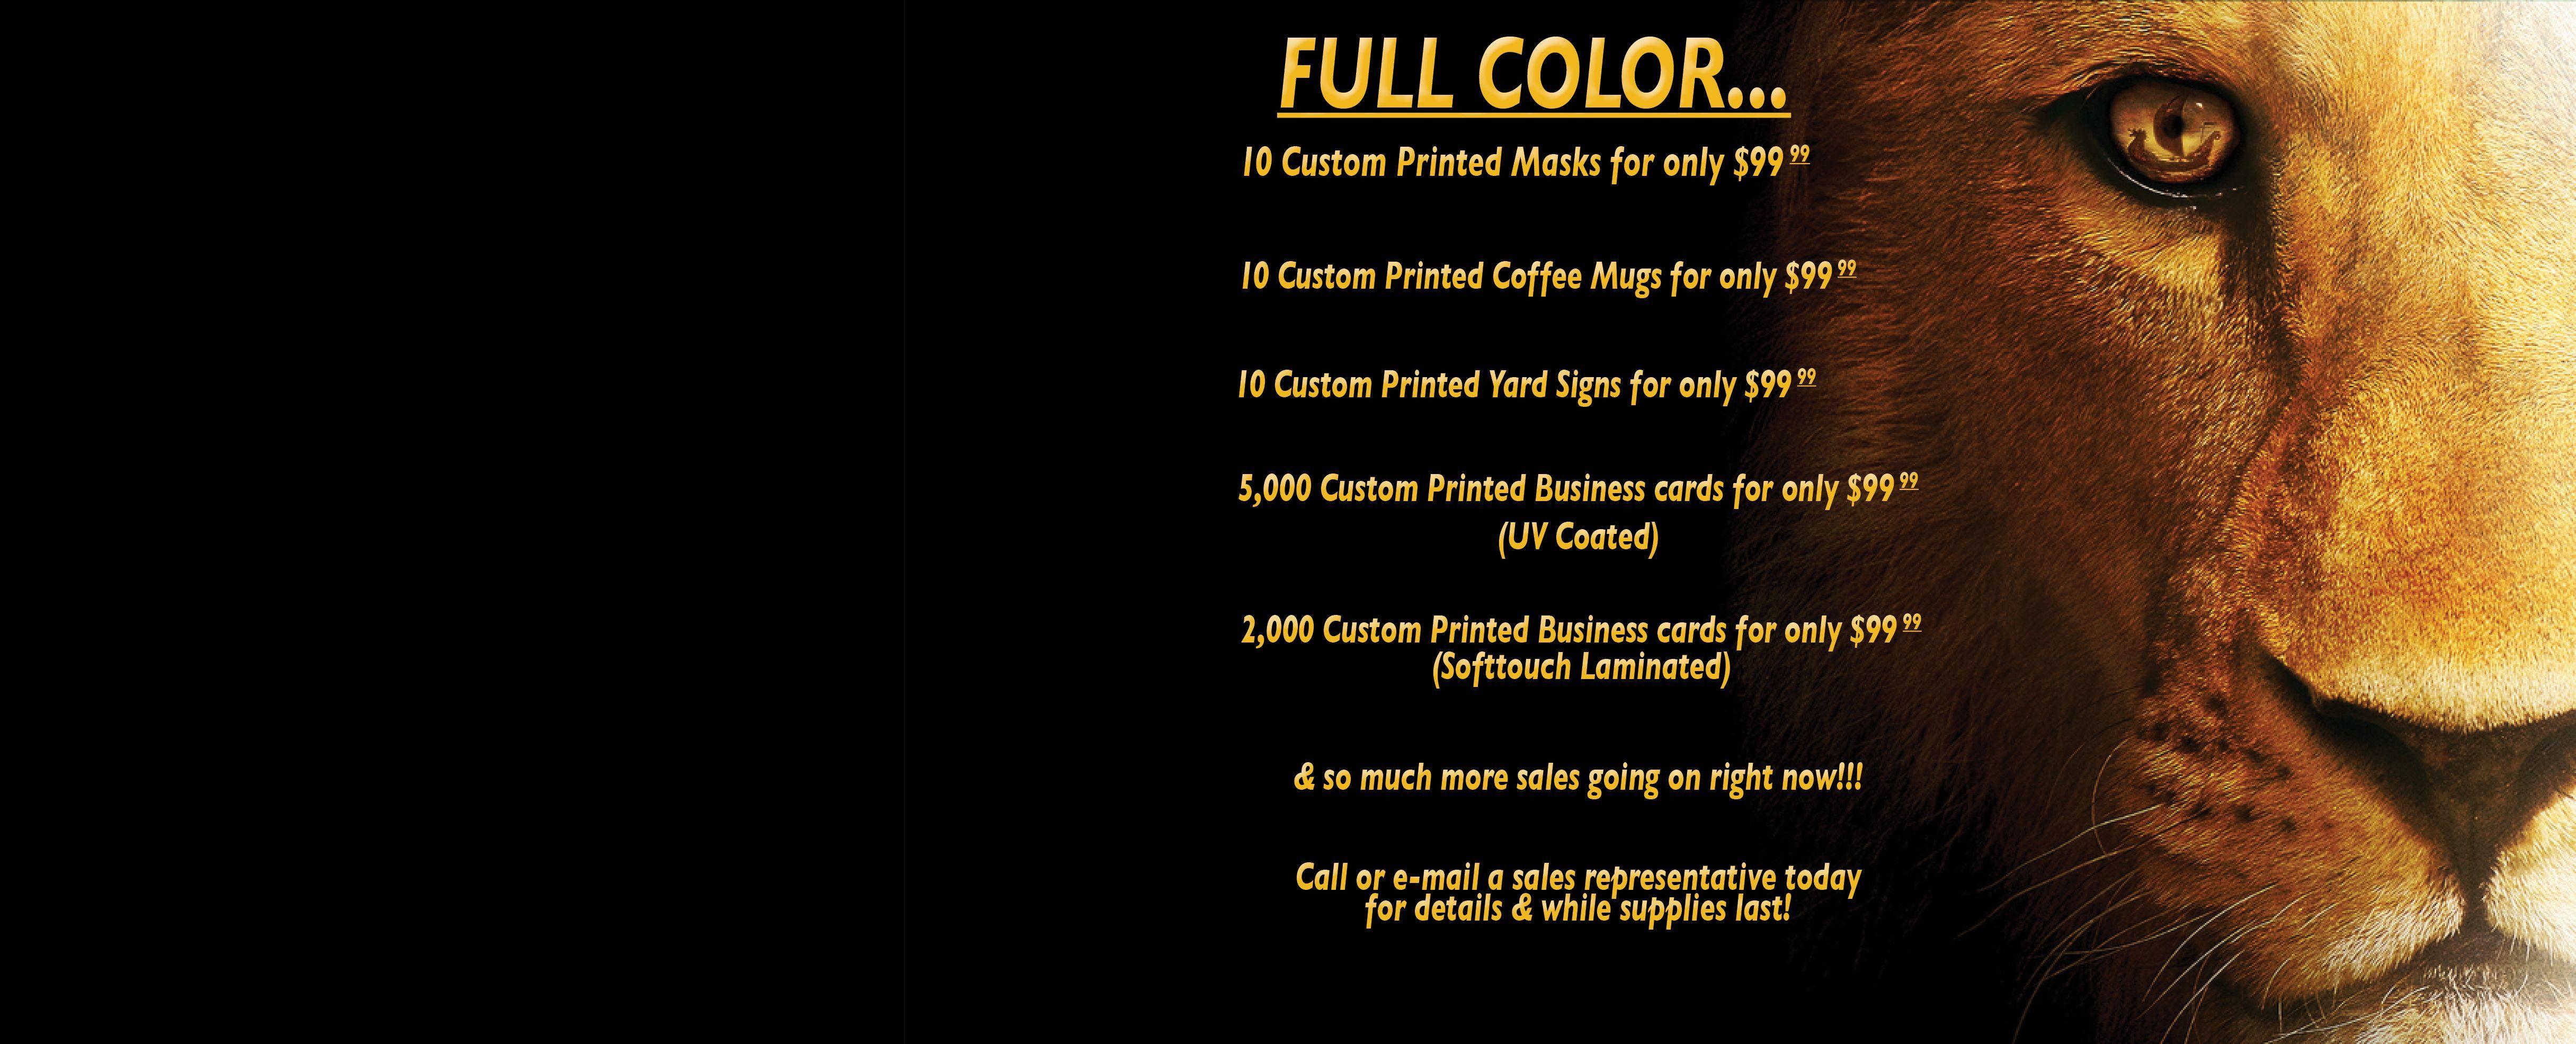 You name it! We print it!